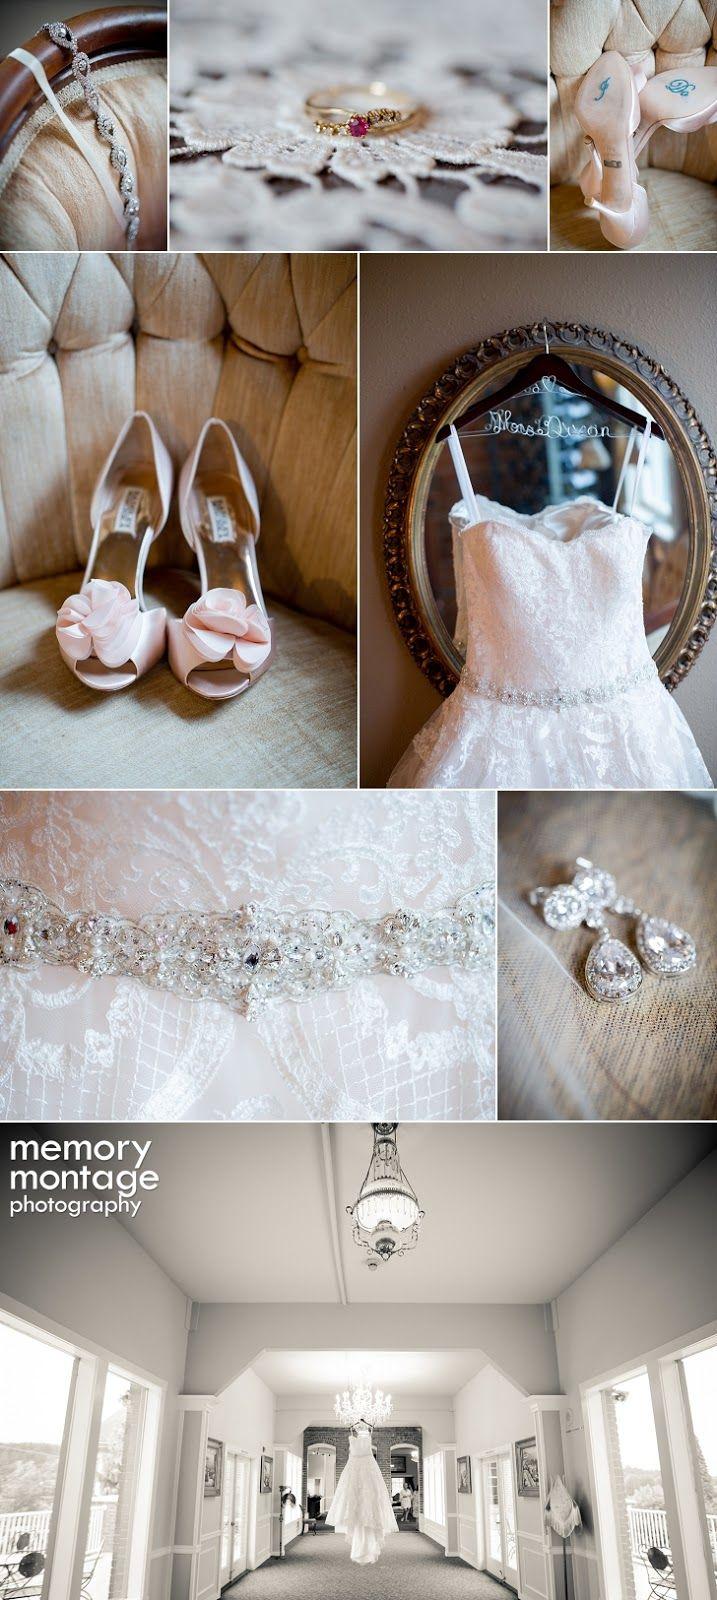 Hollywood Schoolhouse Wedding, Woodinville, WA, Seattle Wedding Photography, www.memorymp.com, #memorymontagephotography, bride and groom, blush wedding, bridal party,Memory Montage Photography